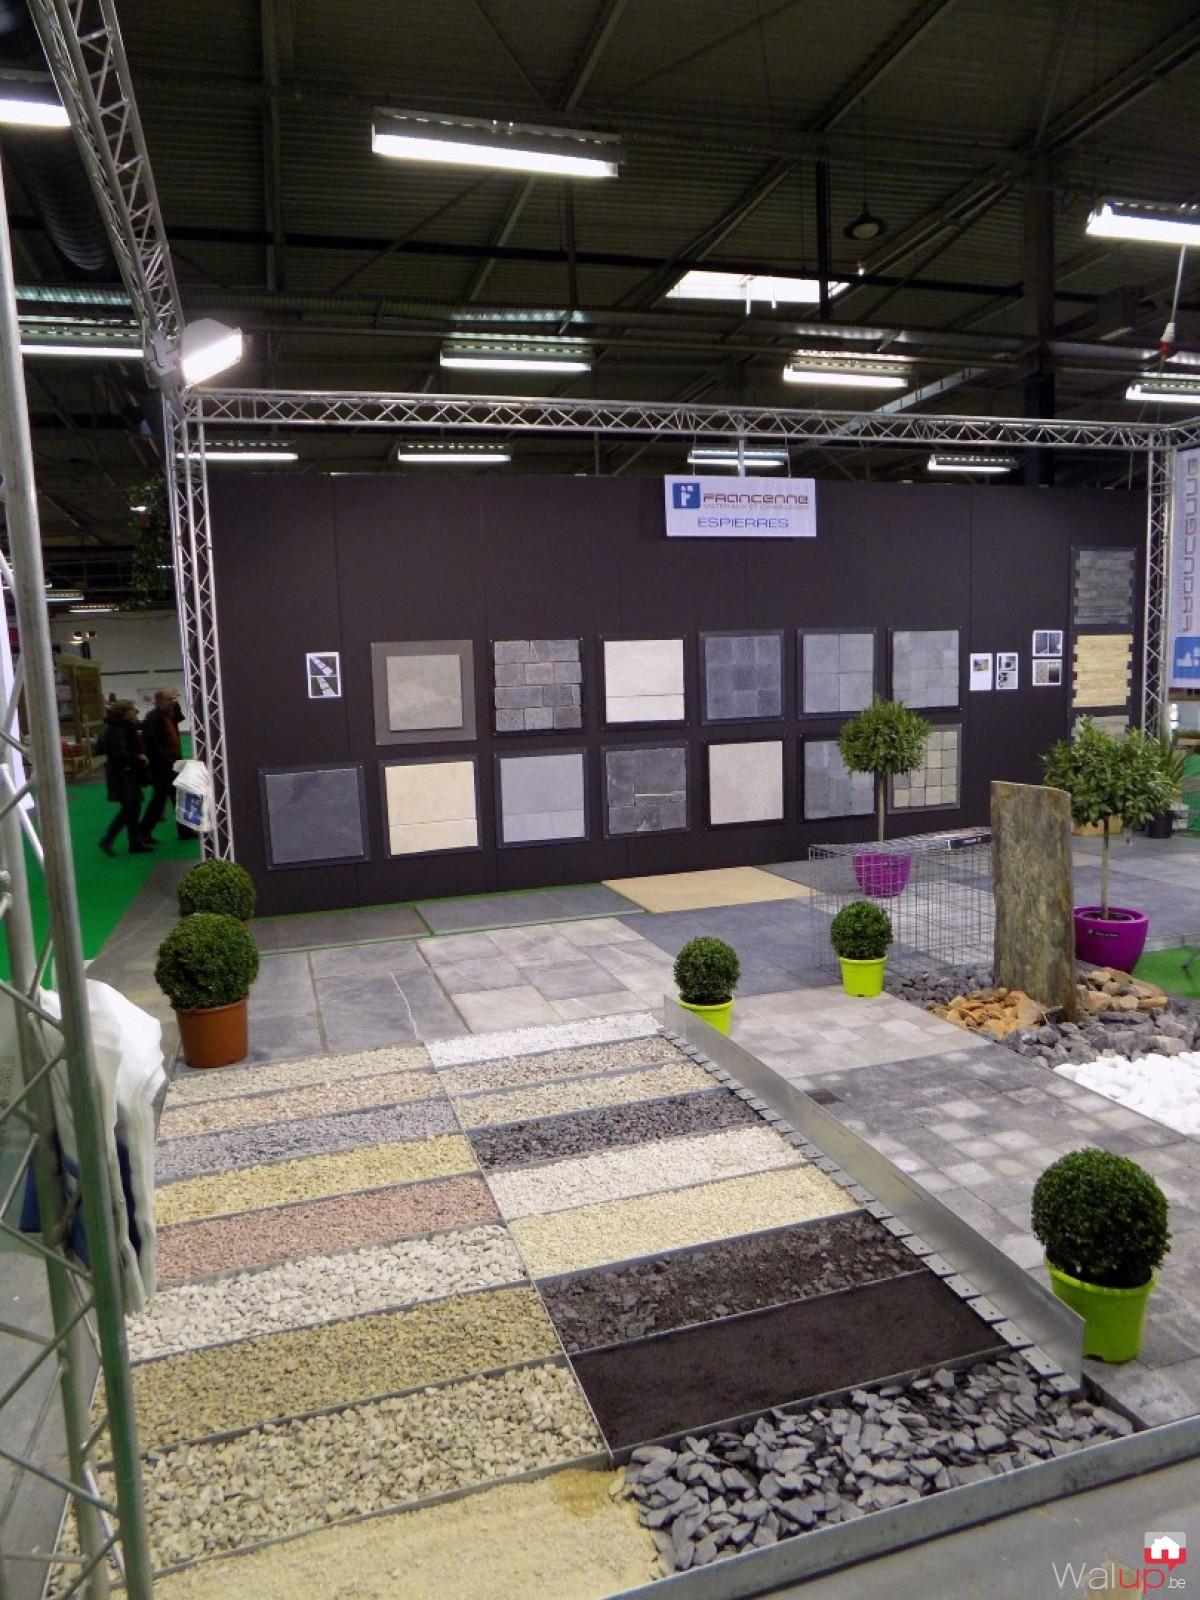 Stand francenne d co jardin tournai par francenne for Deco jardin tournai 2015